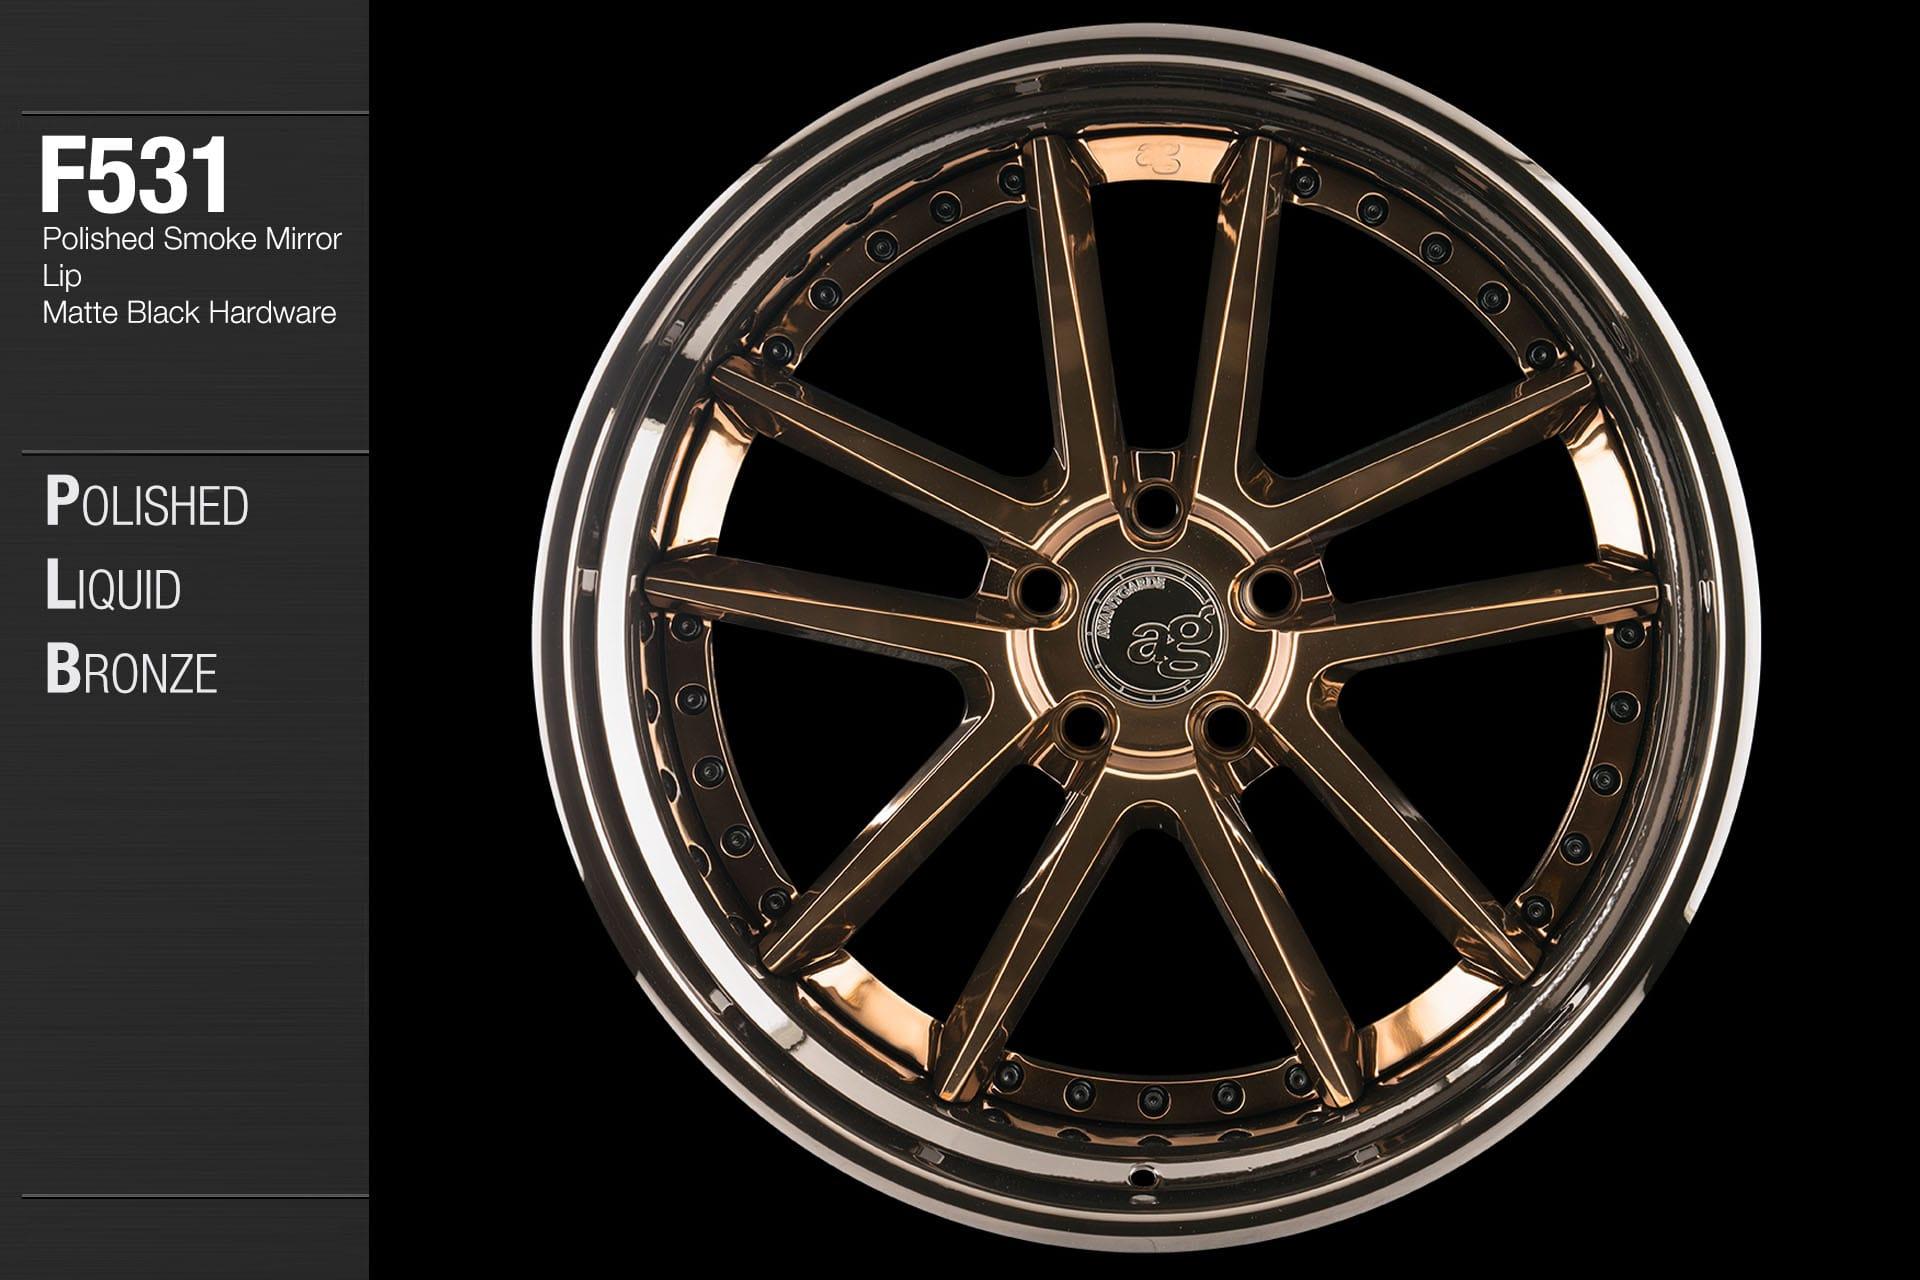 avant-garde-ag-wheels-f531-polished-liquid-bronze-face-smoke-mirror-lip-matte-black-hardware-1-min